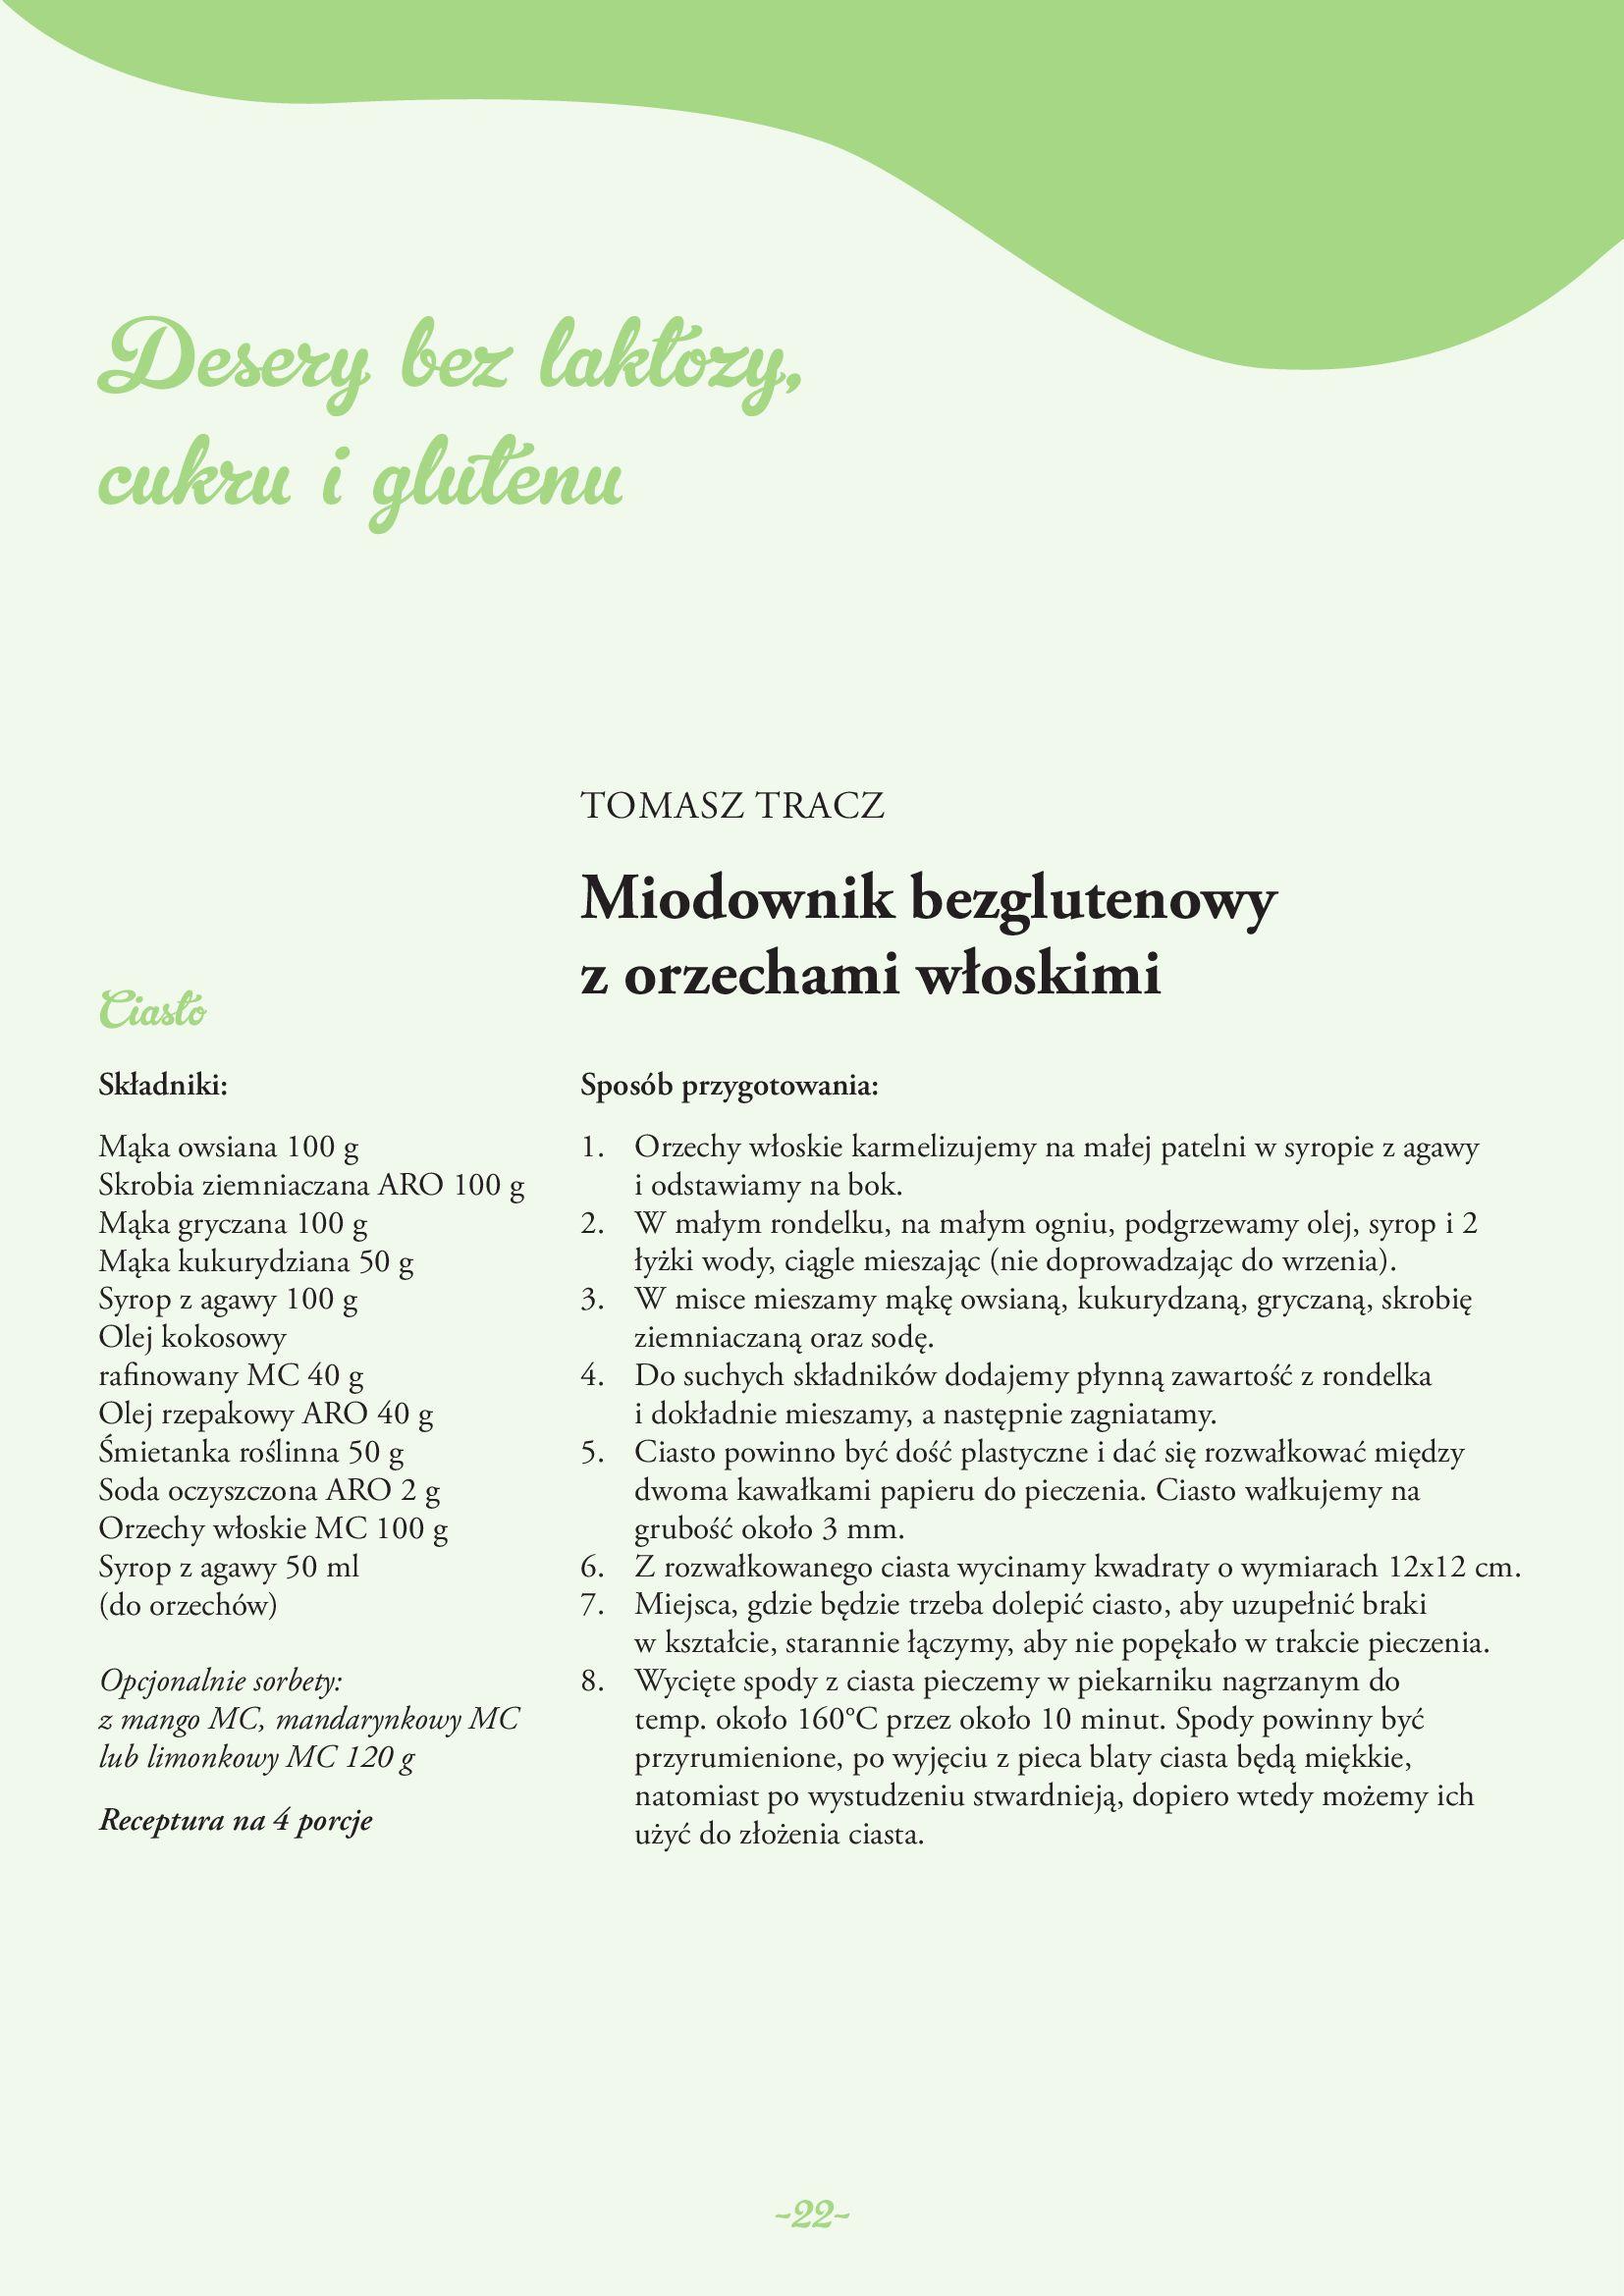 Gazetka Makro: Gazetka Makro - lody i desery 2021-05-21 page-22